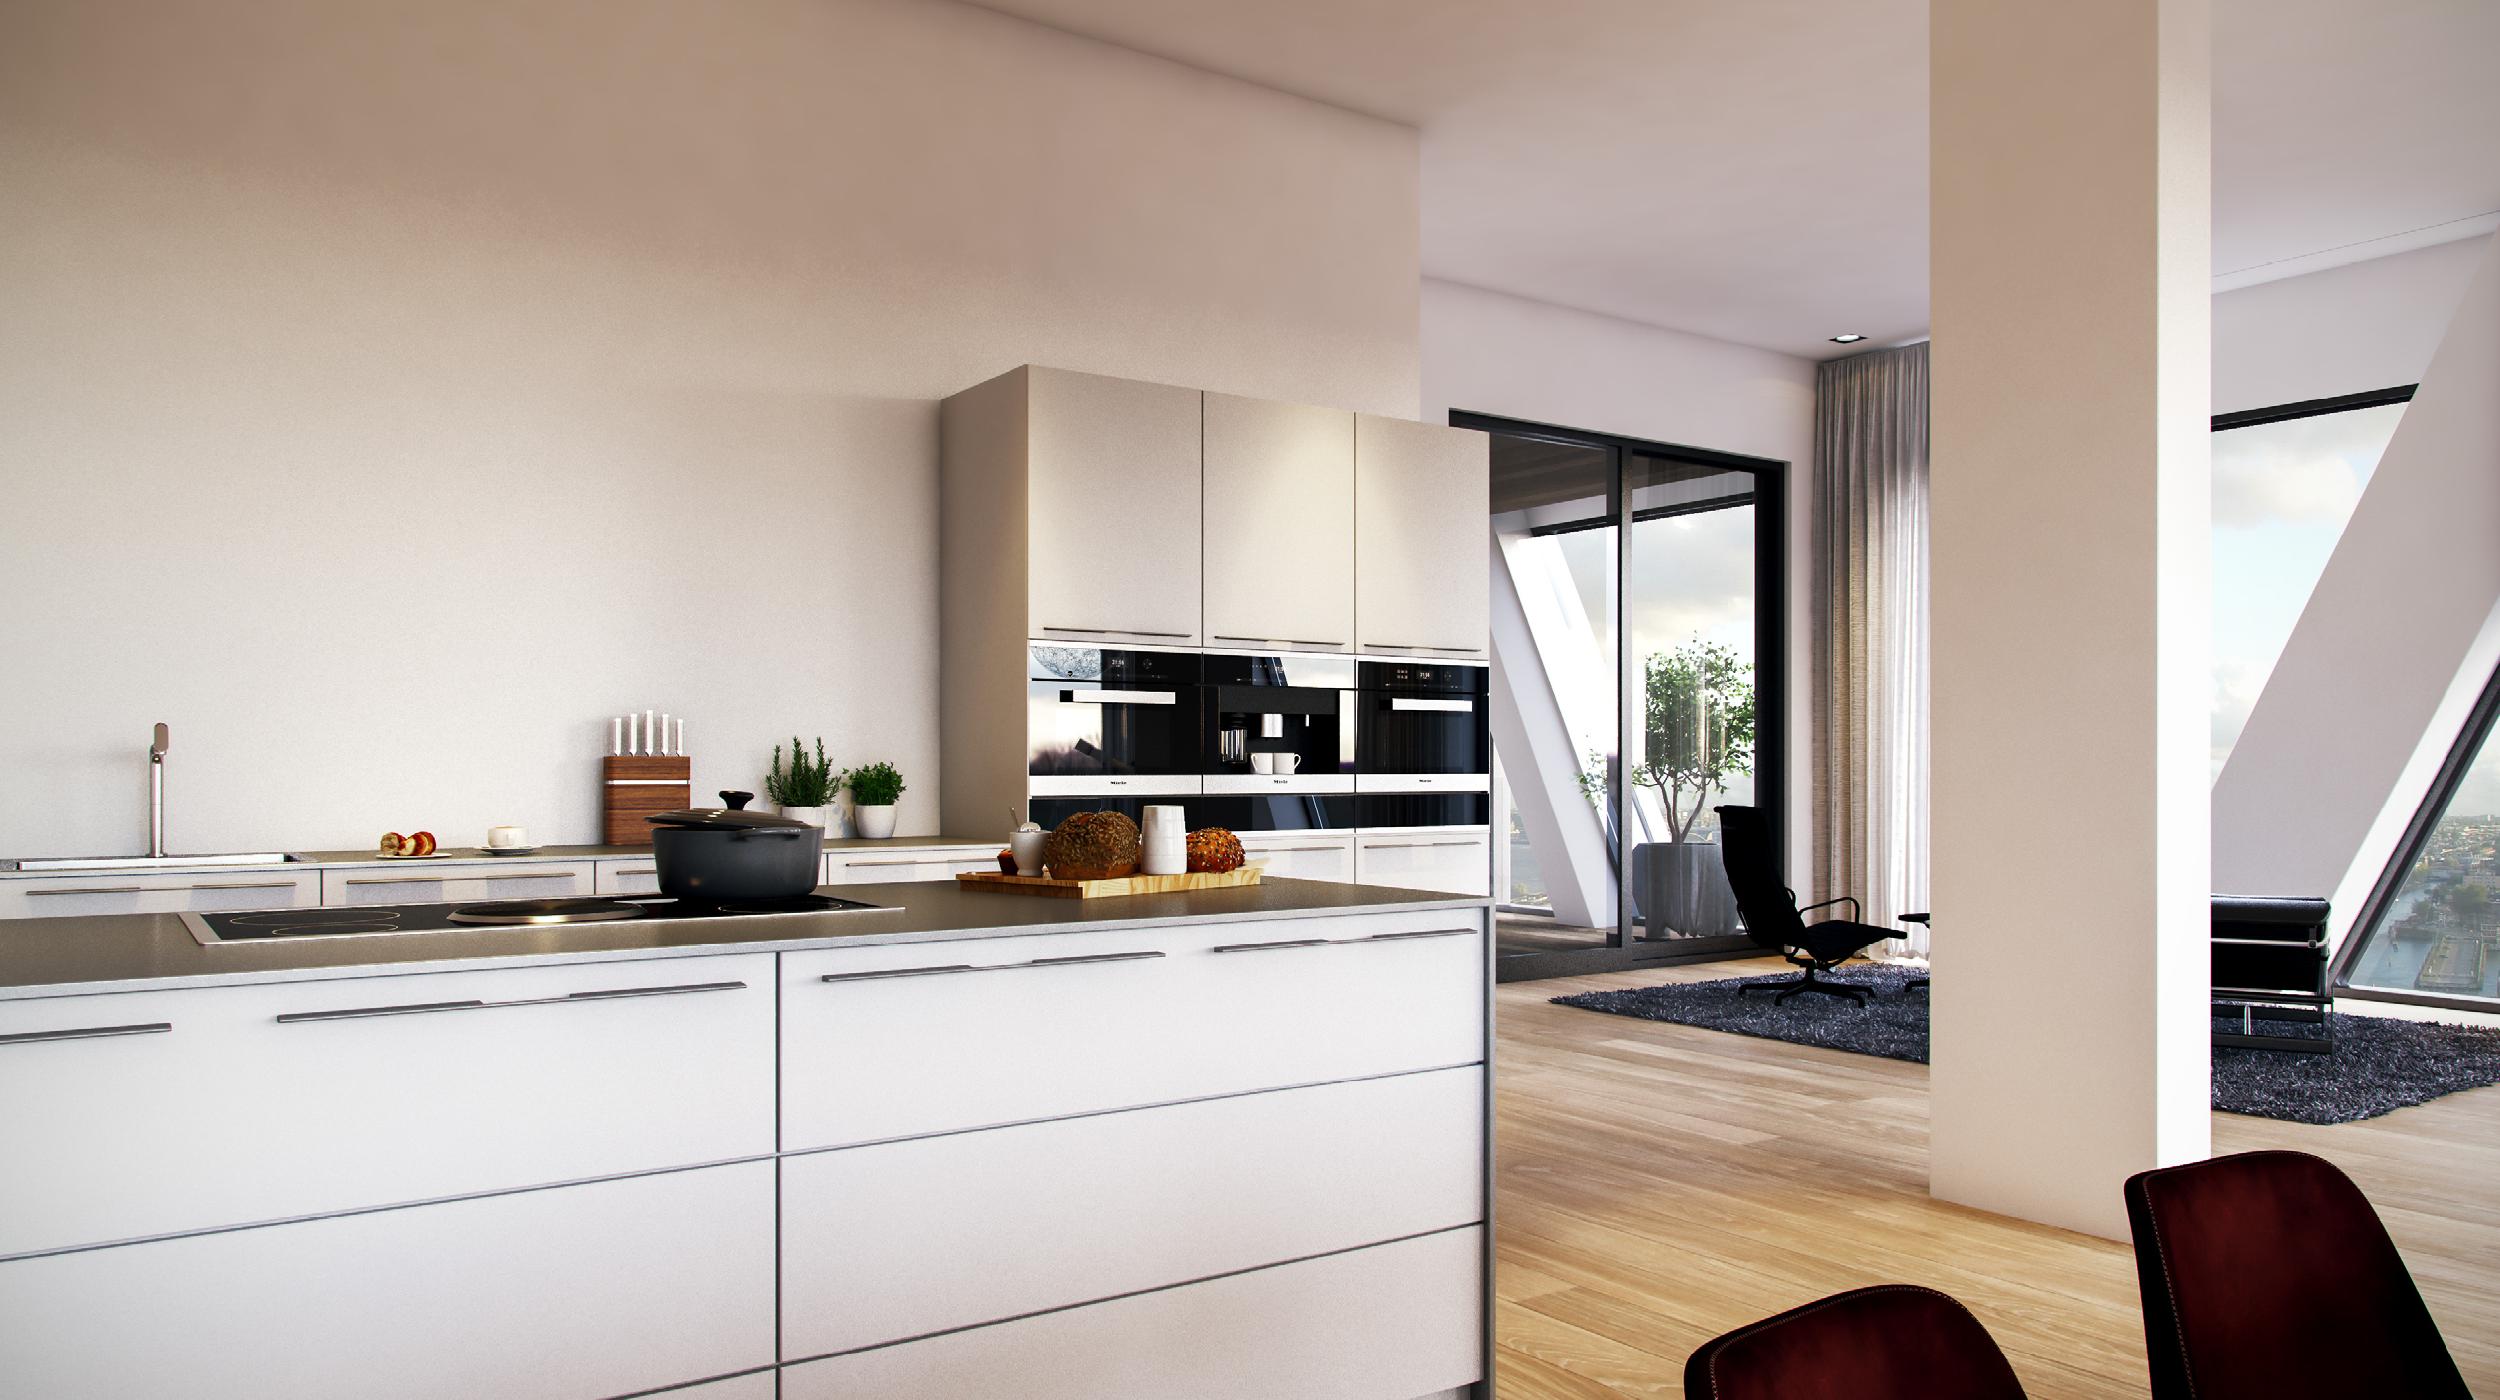 Pontsteiger houthavens Amsterdam keuken en badkamer